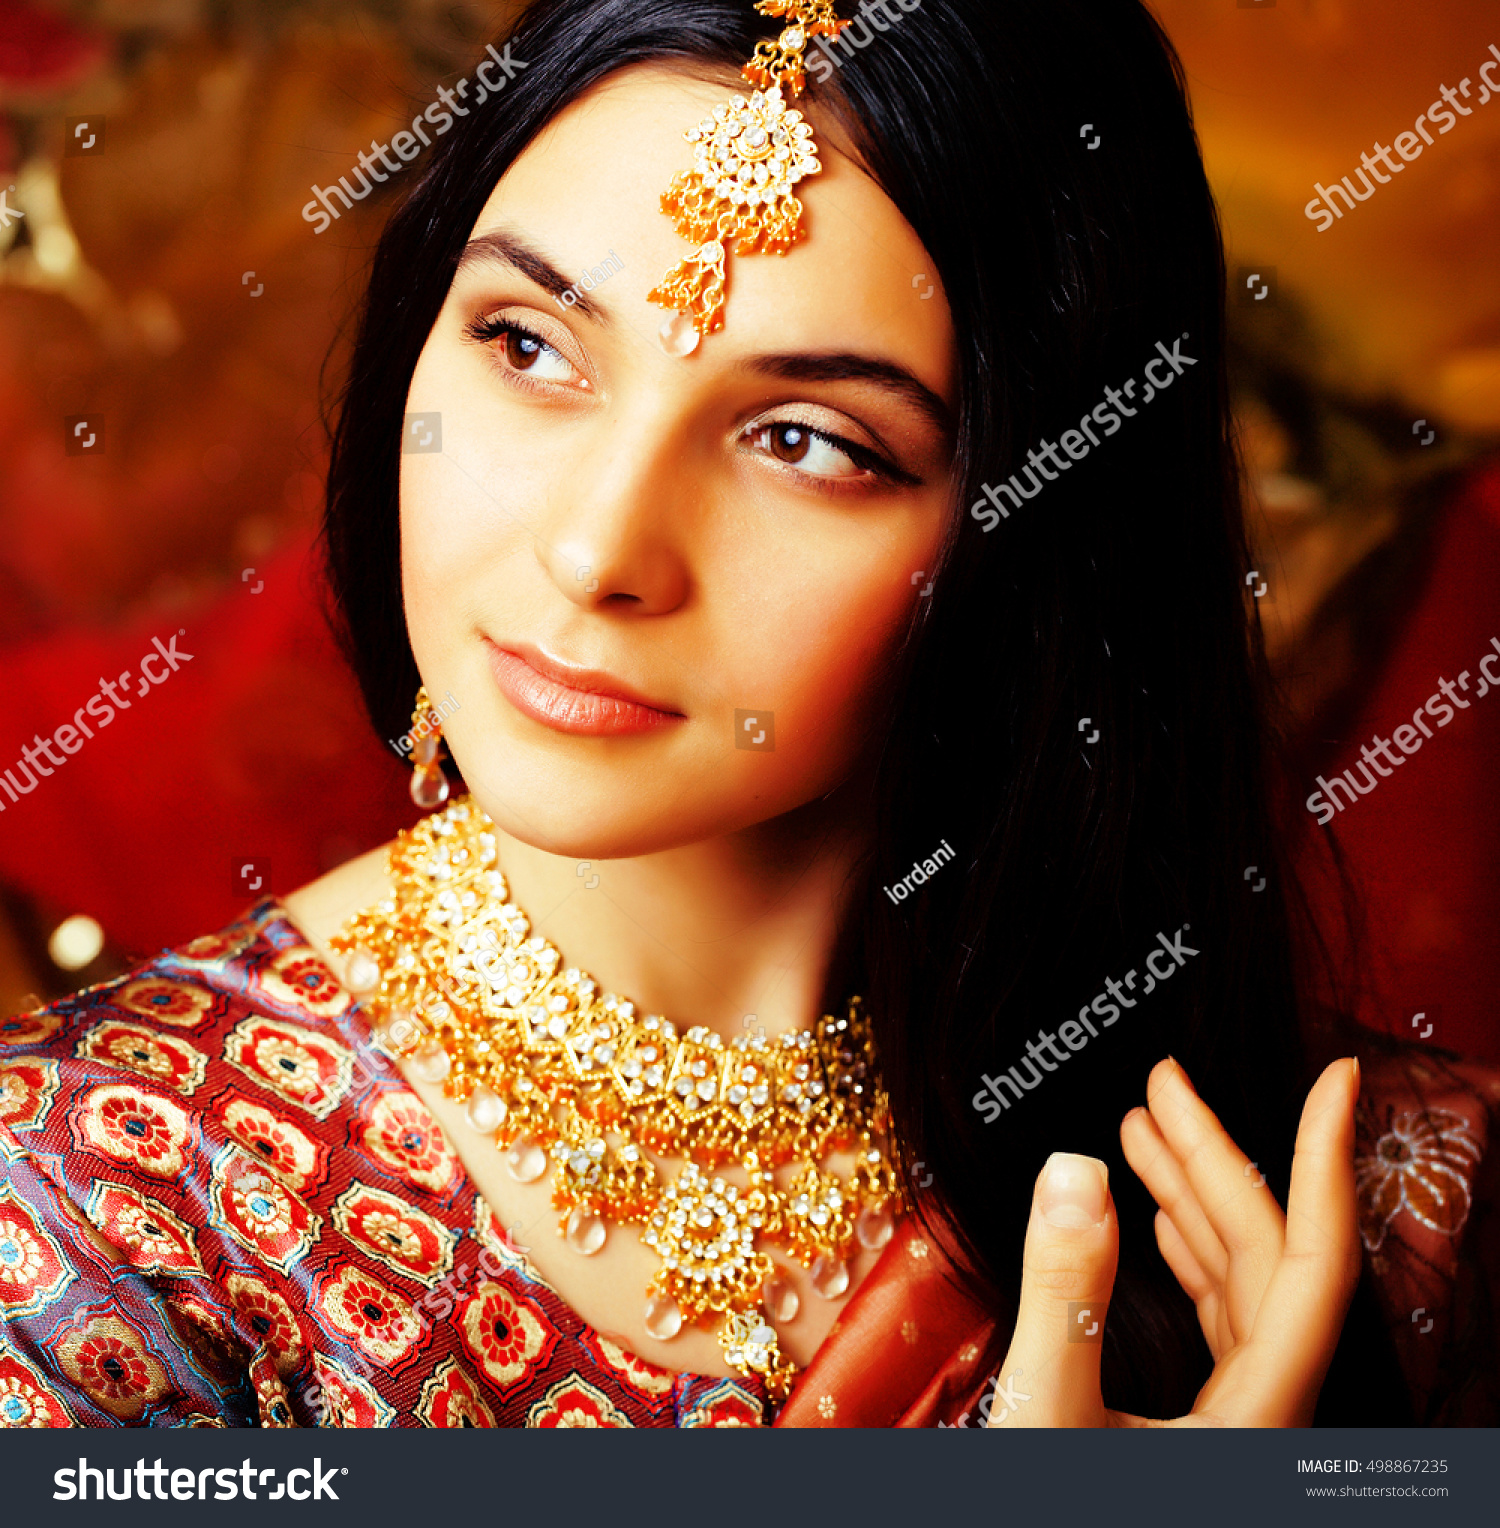 beauty sweet real indian girl sari stock photo (100% legal